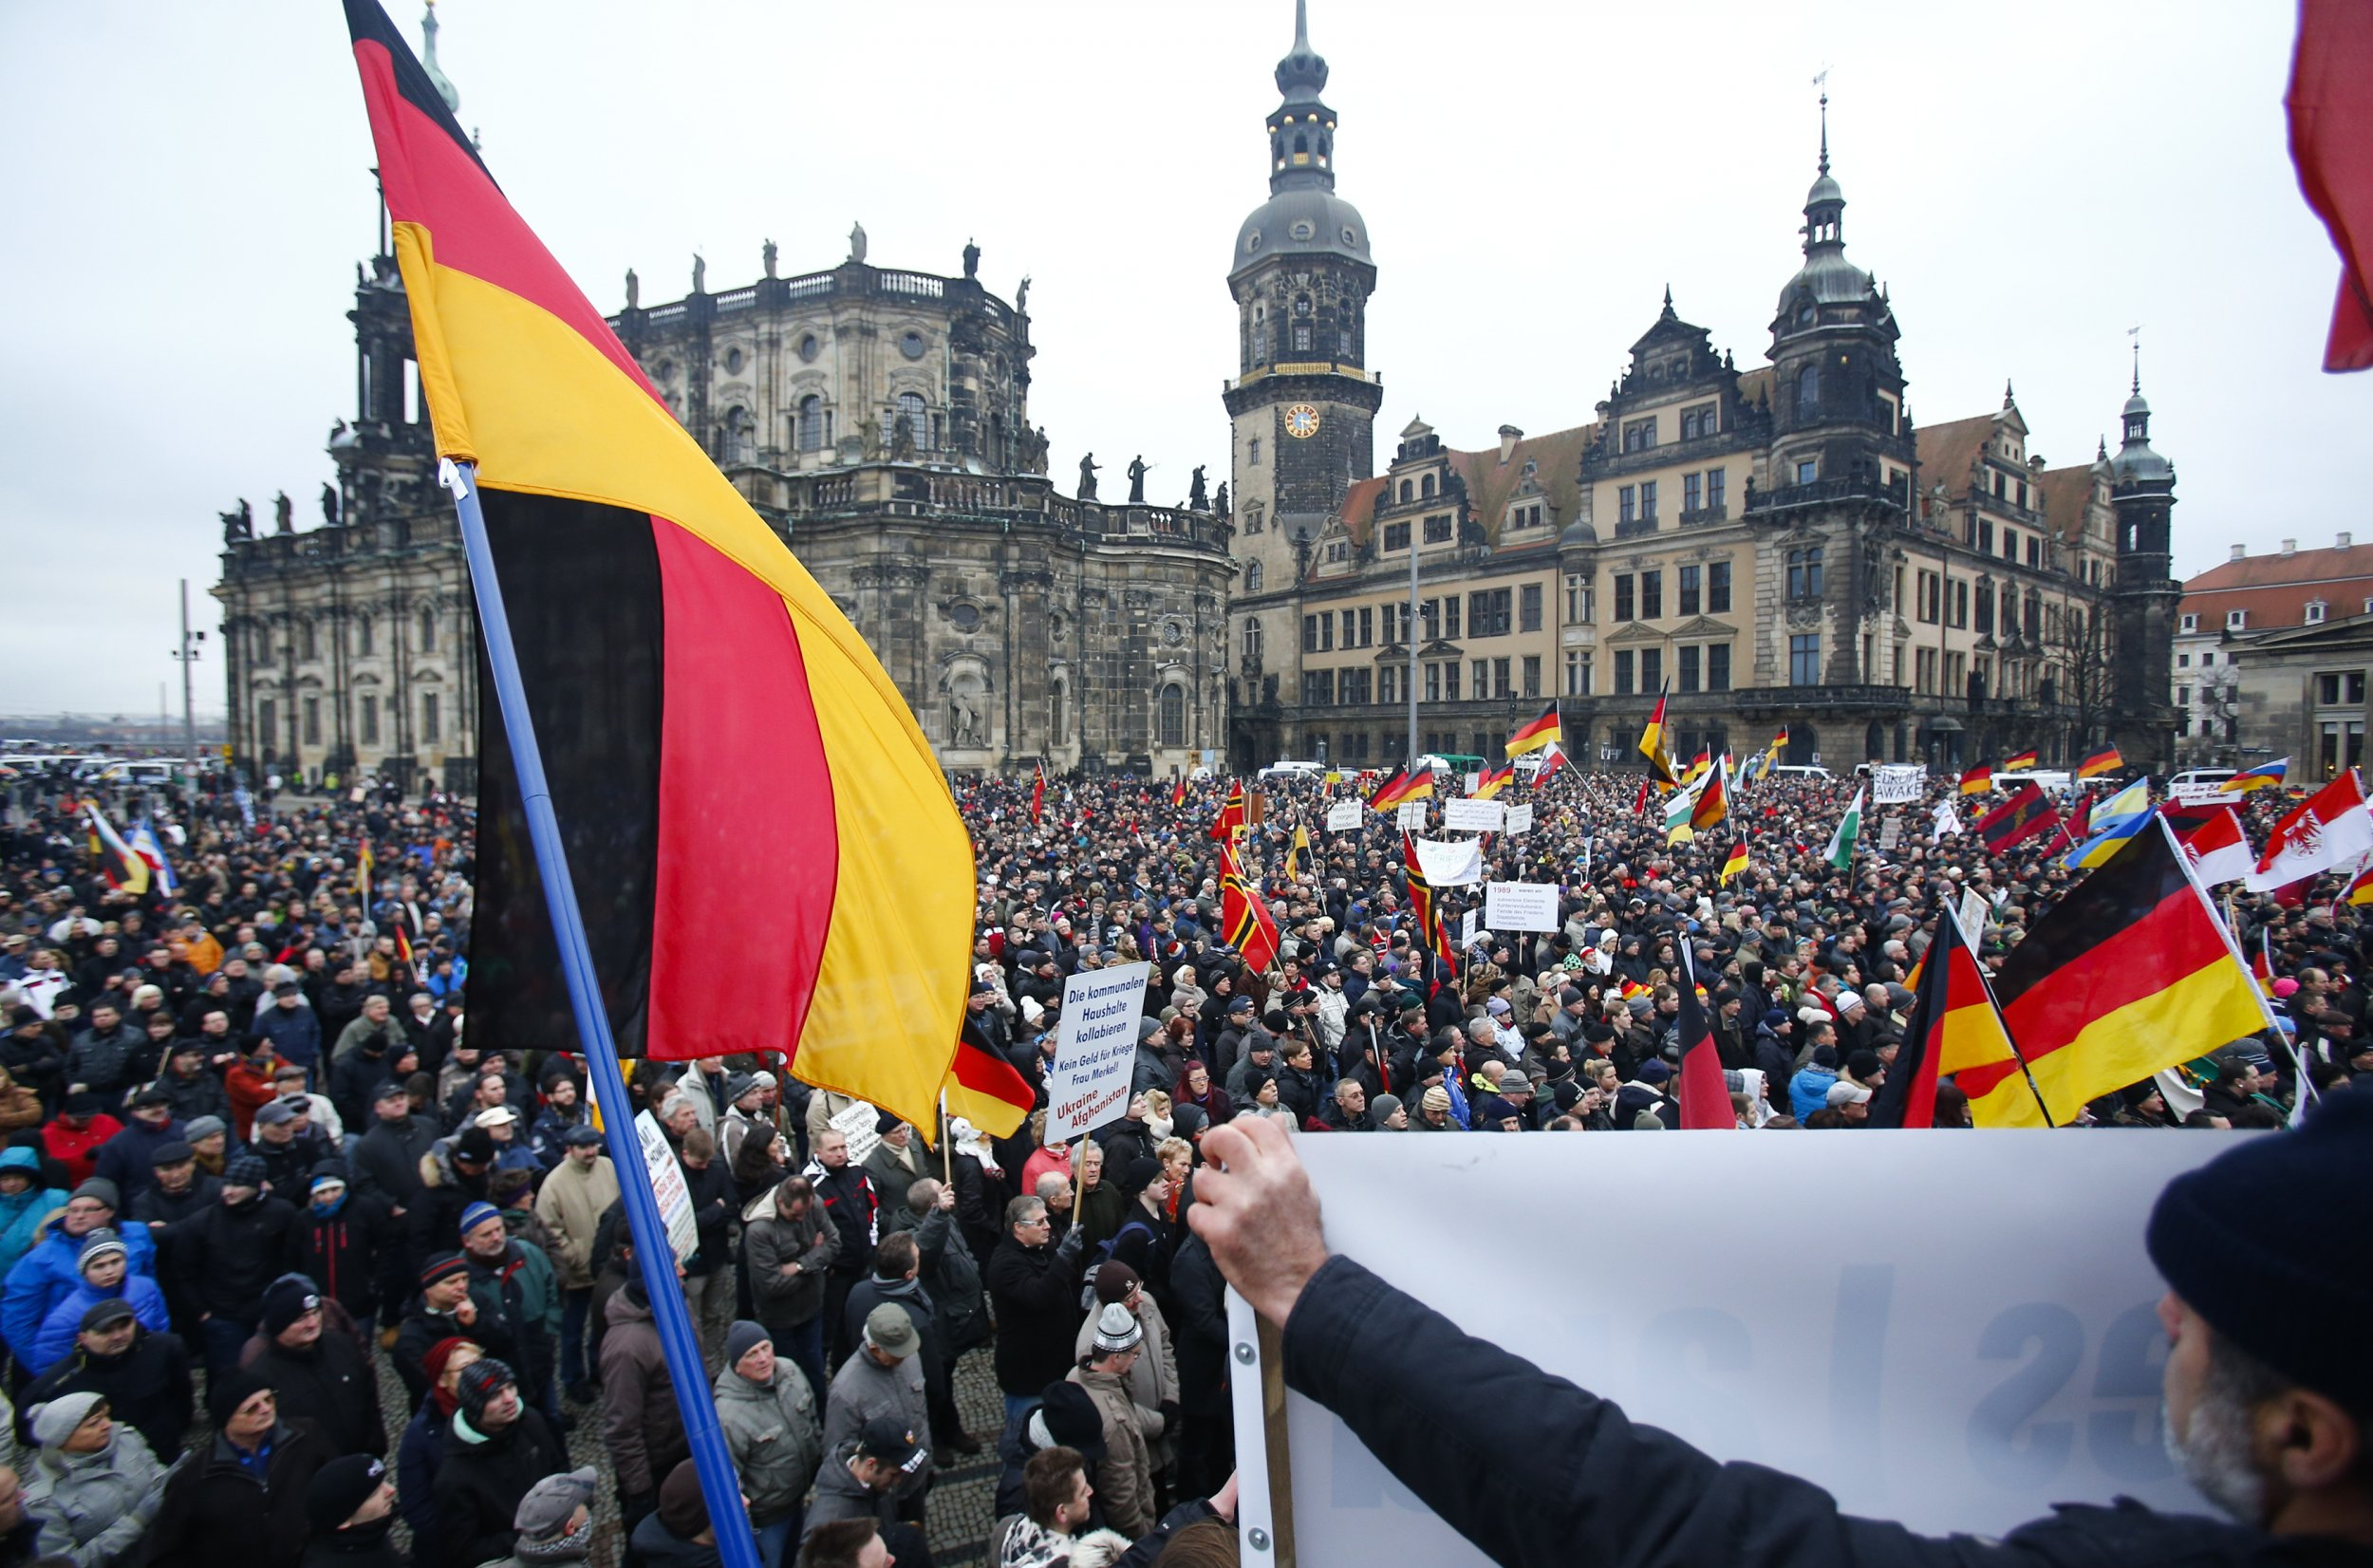 PEGIDA members demonstrate in Dresden